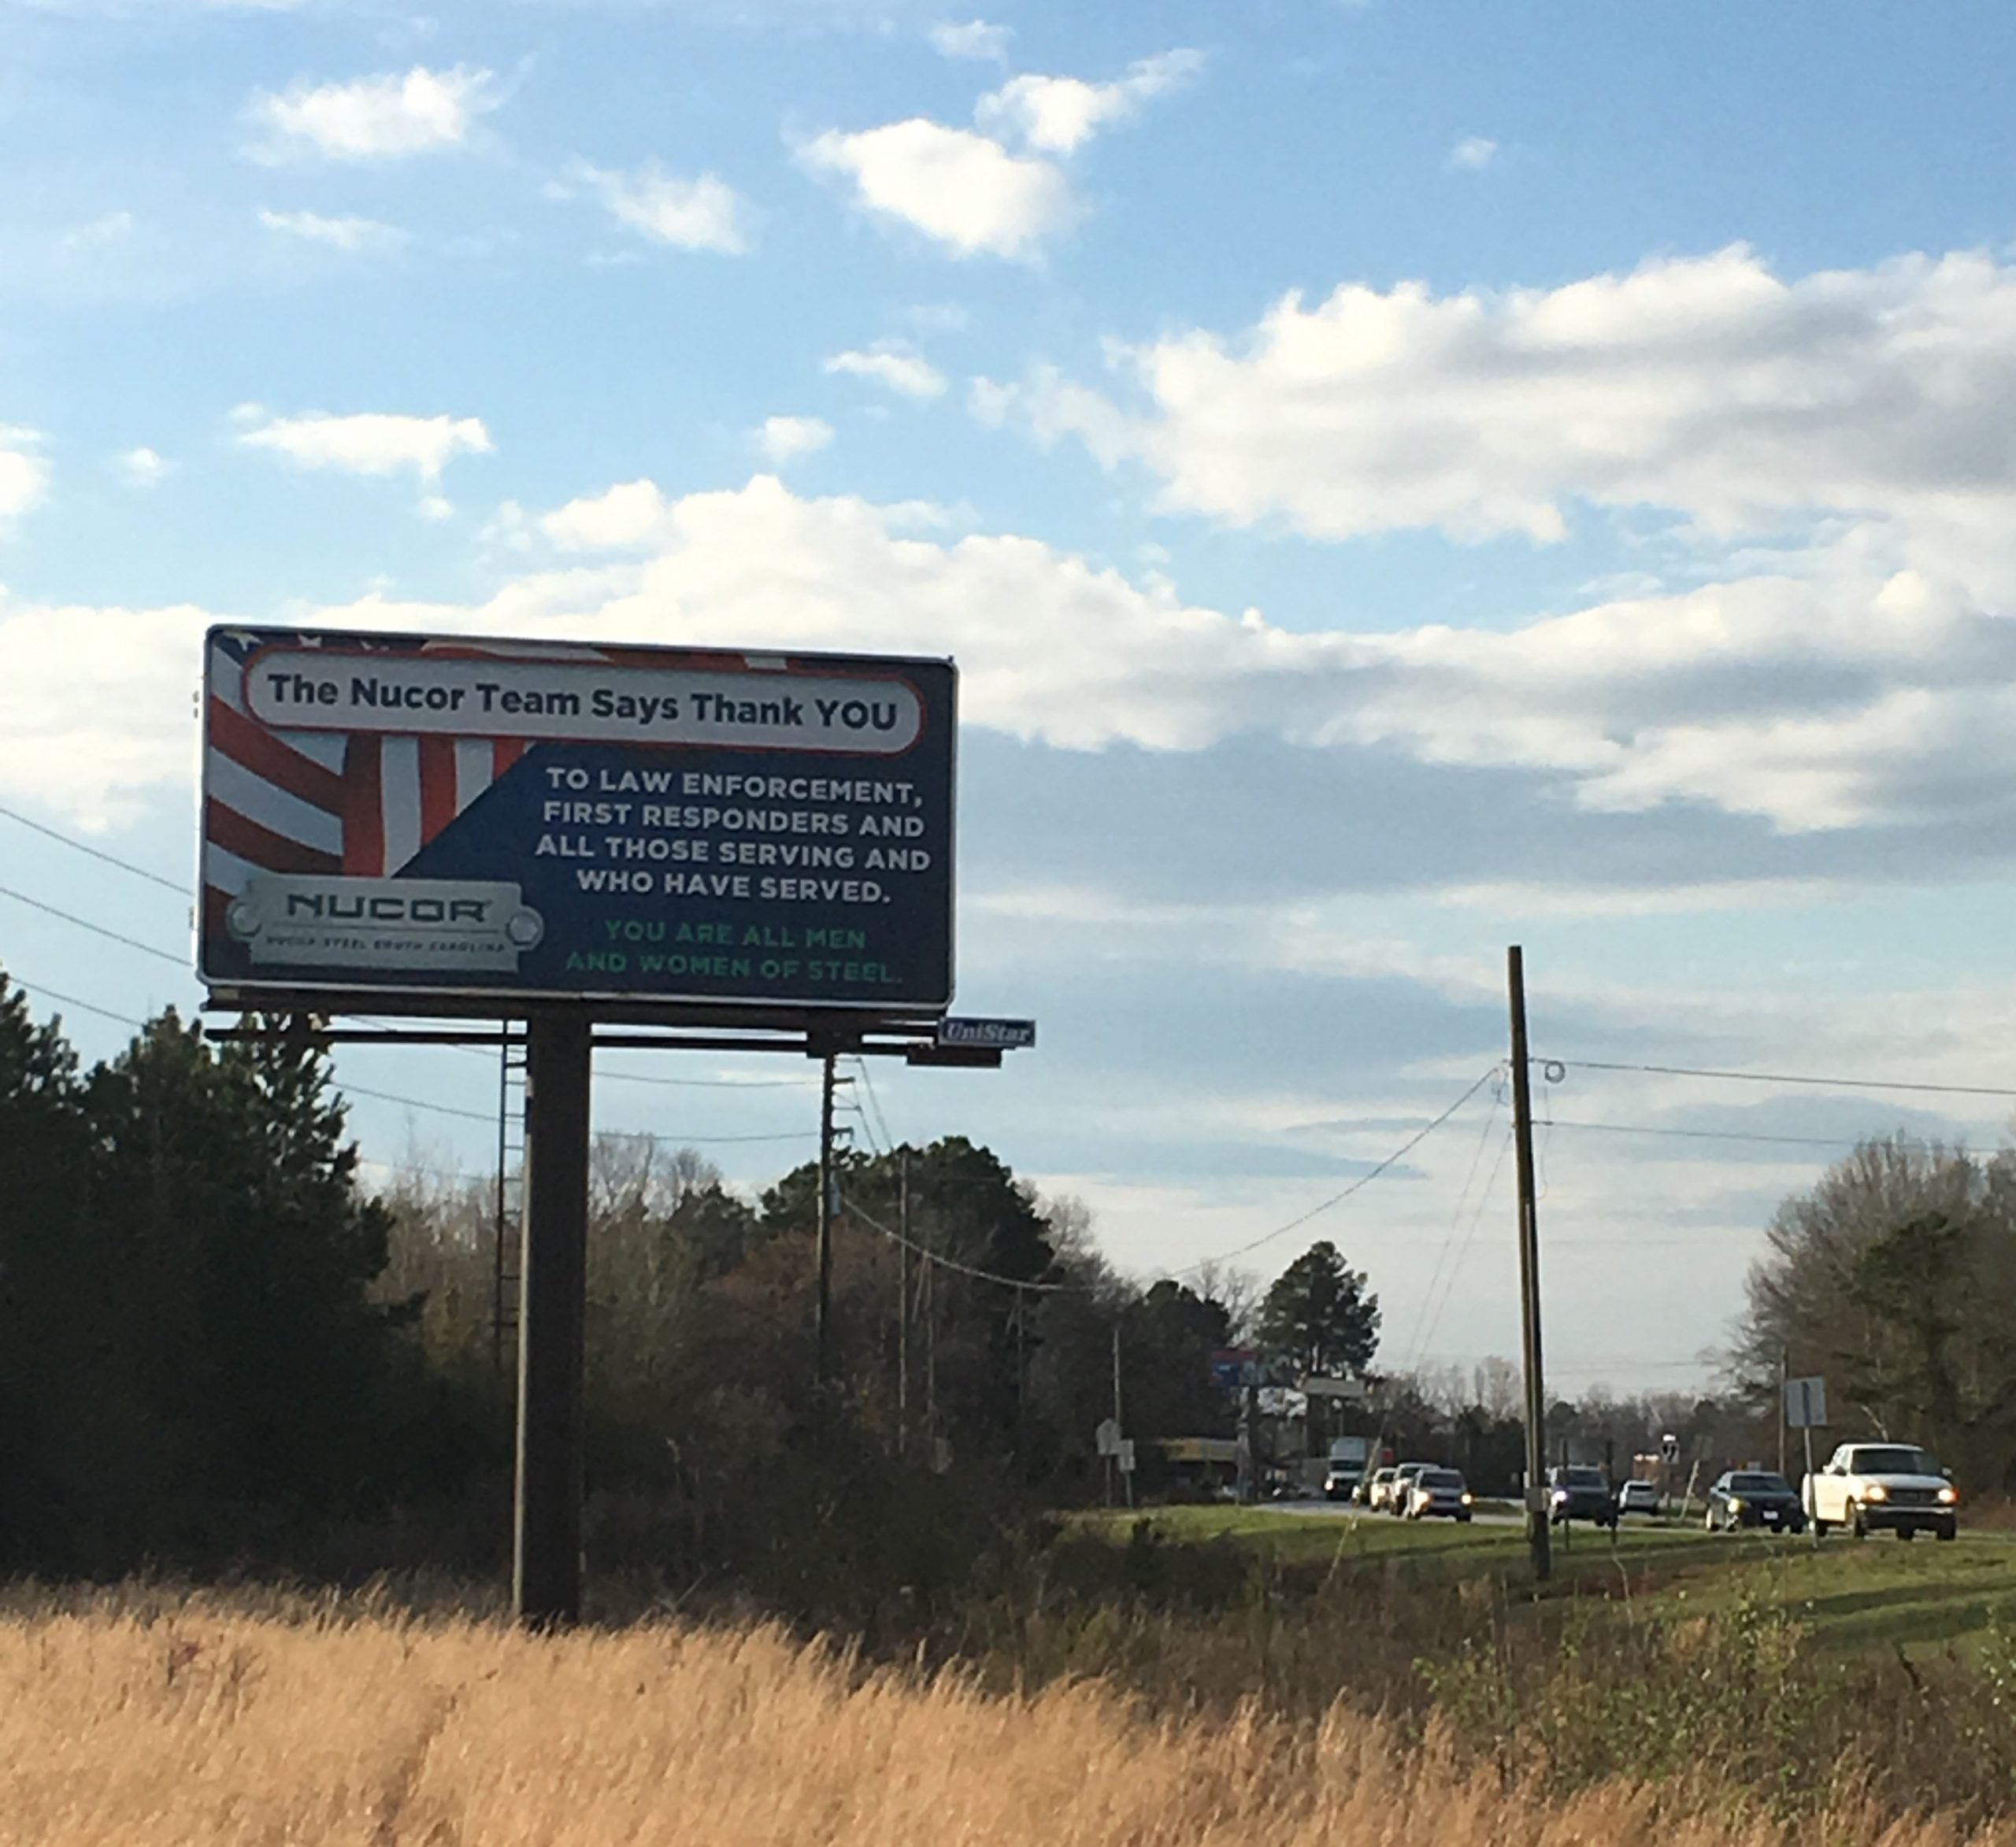 Outdoor-Advertising-Billboard-VIEW-Inventory